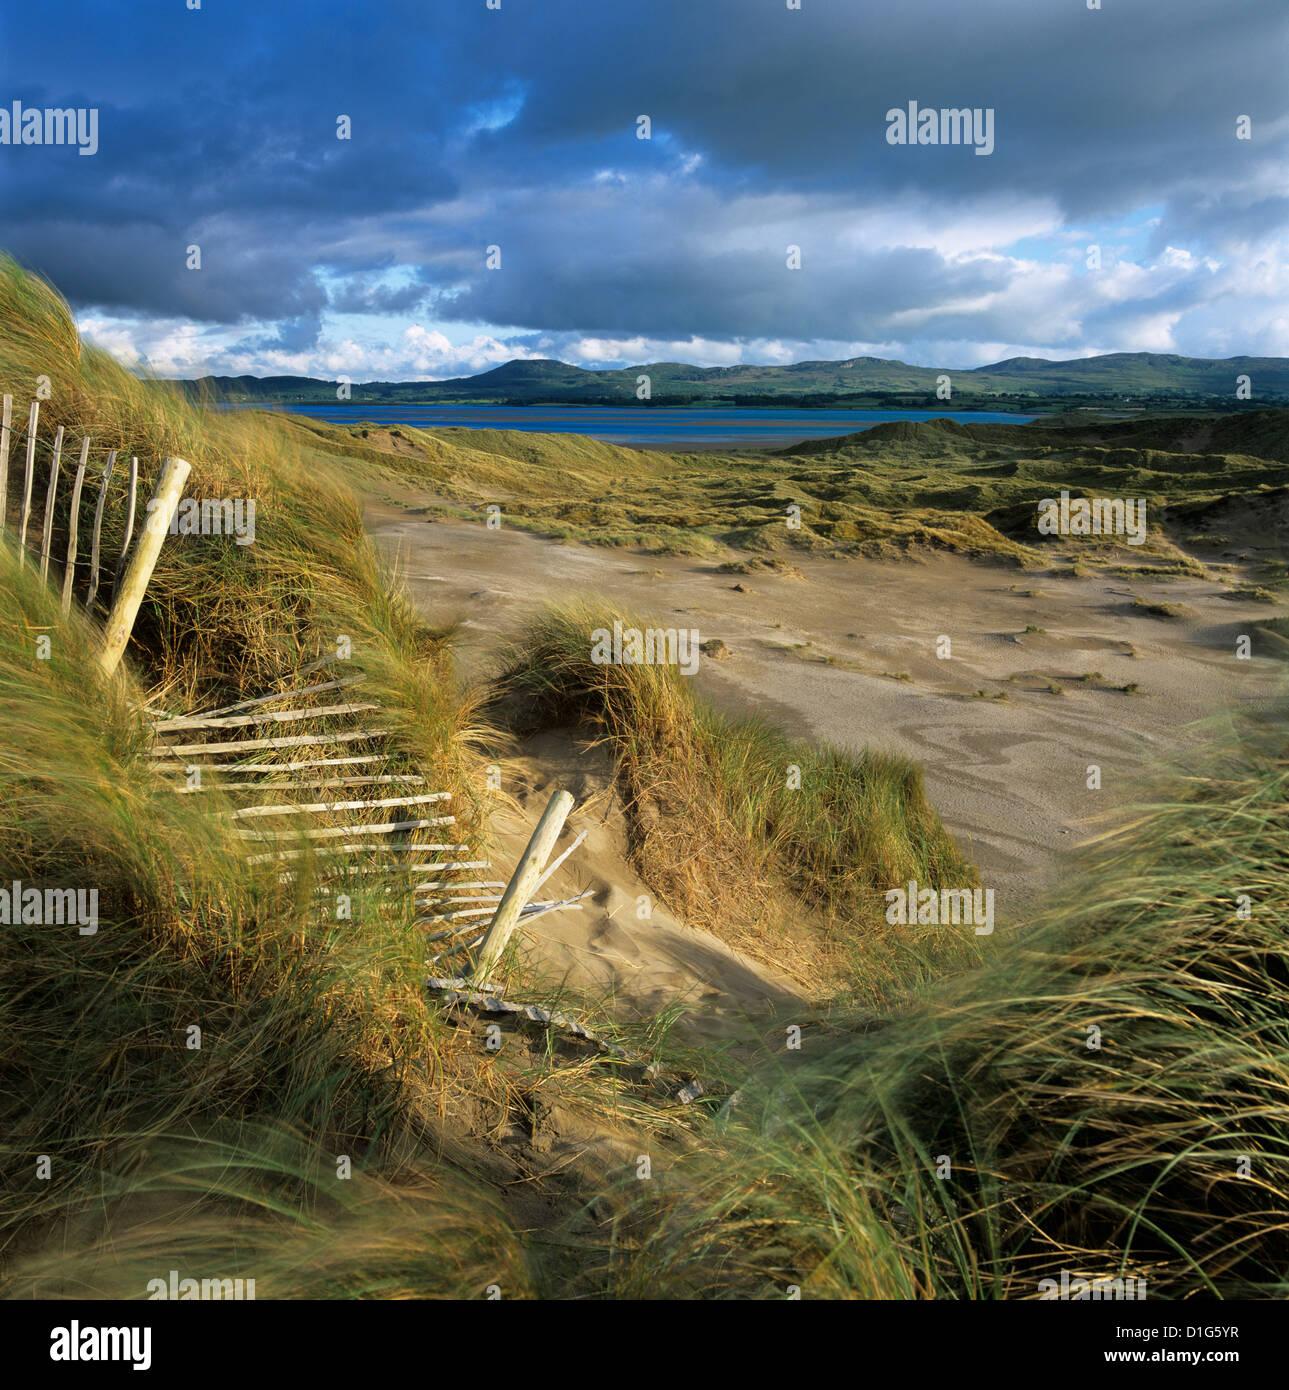 Sand dunes, Strandhill, County Sligo, Connacht, Repubic of Ireland, Europe - Stock Image